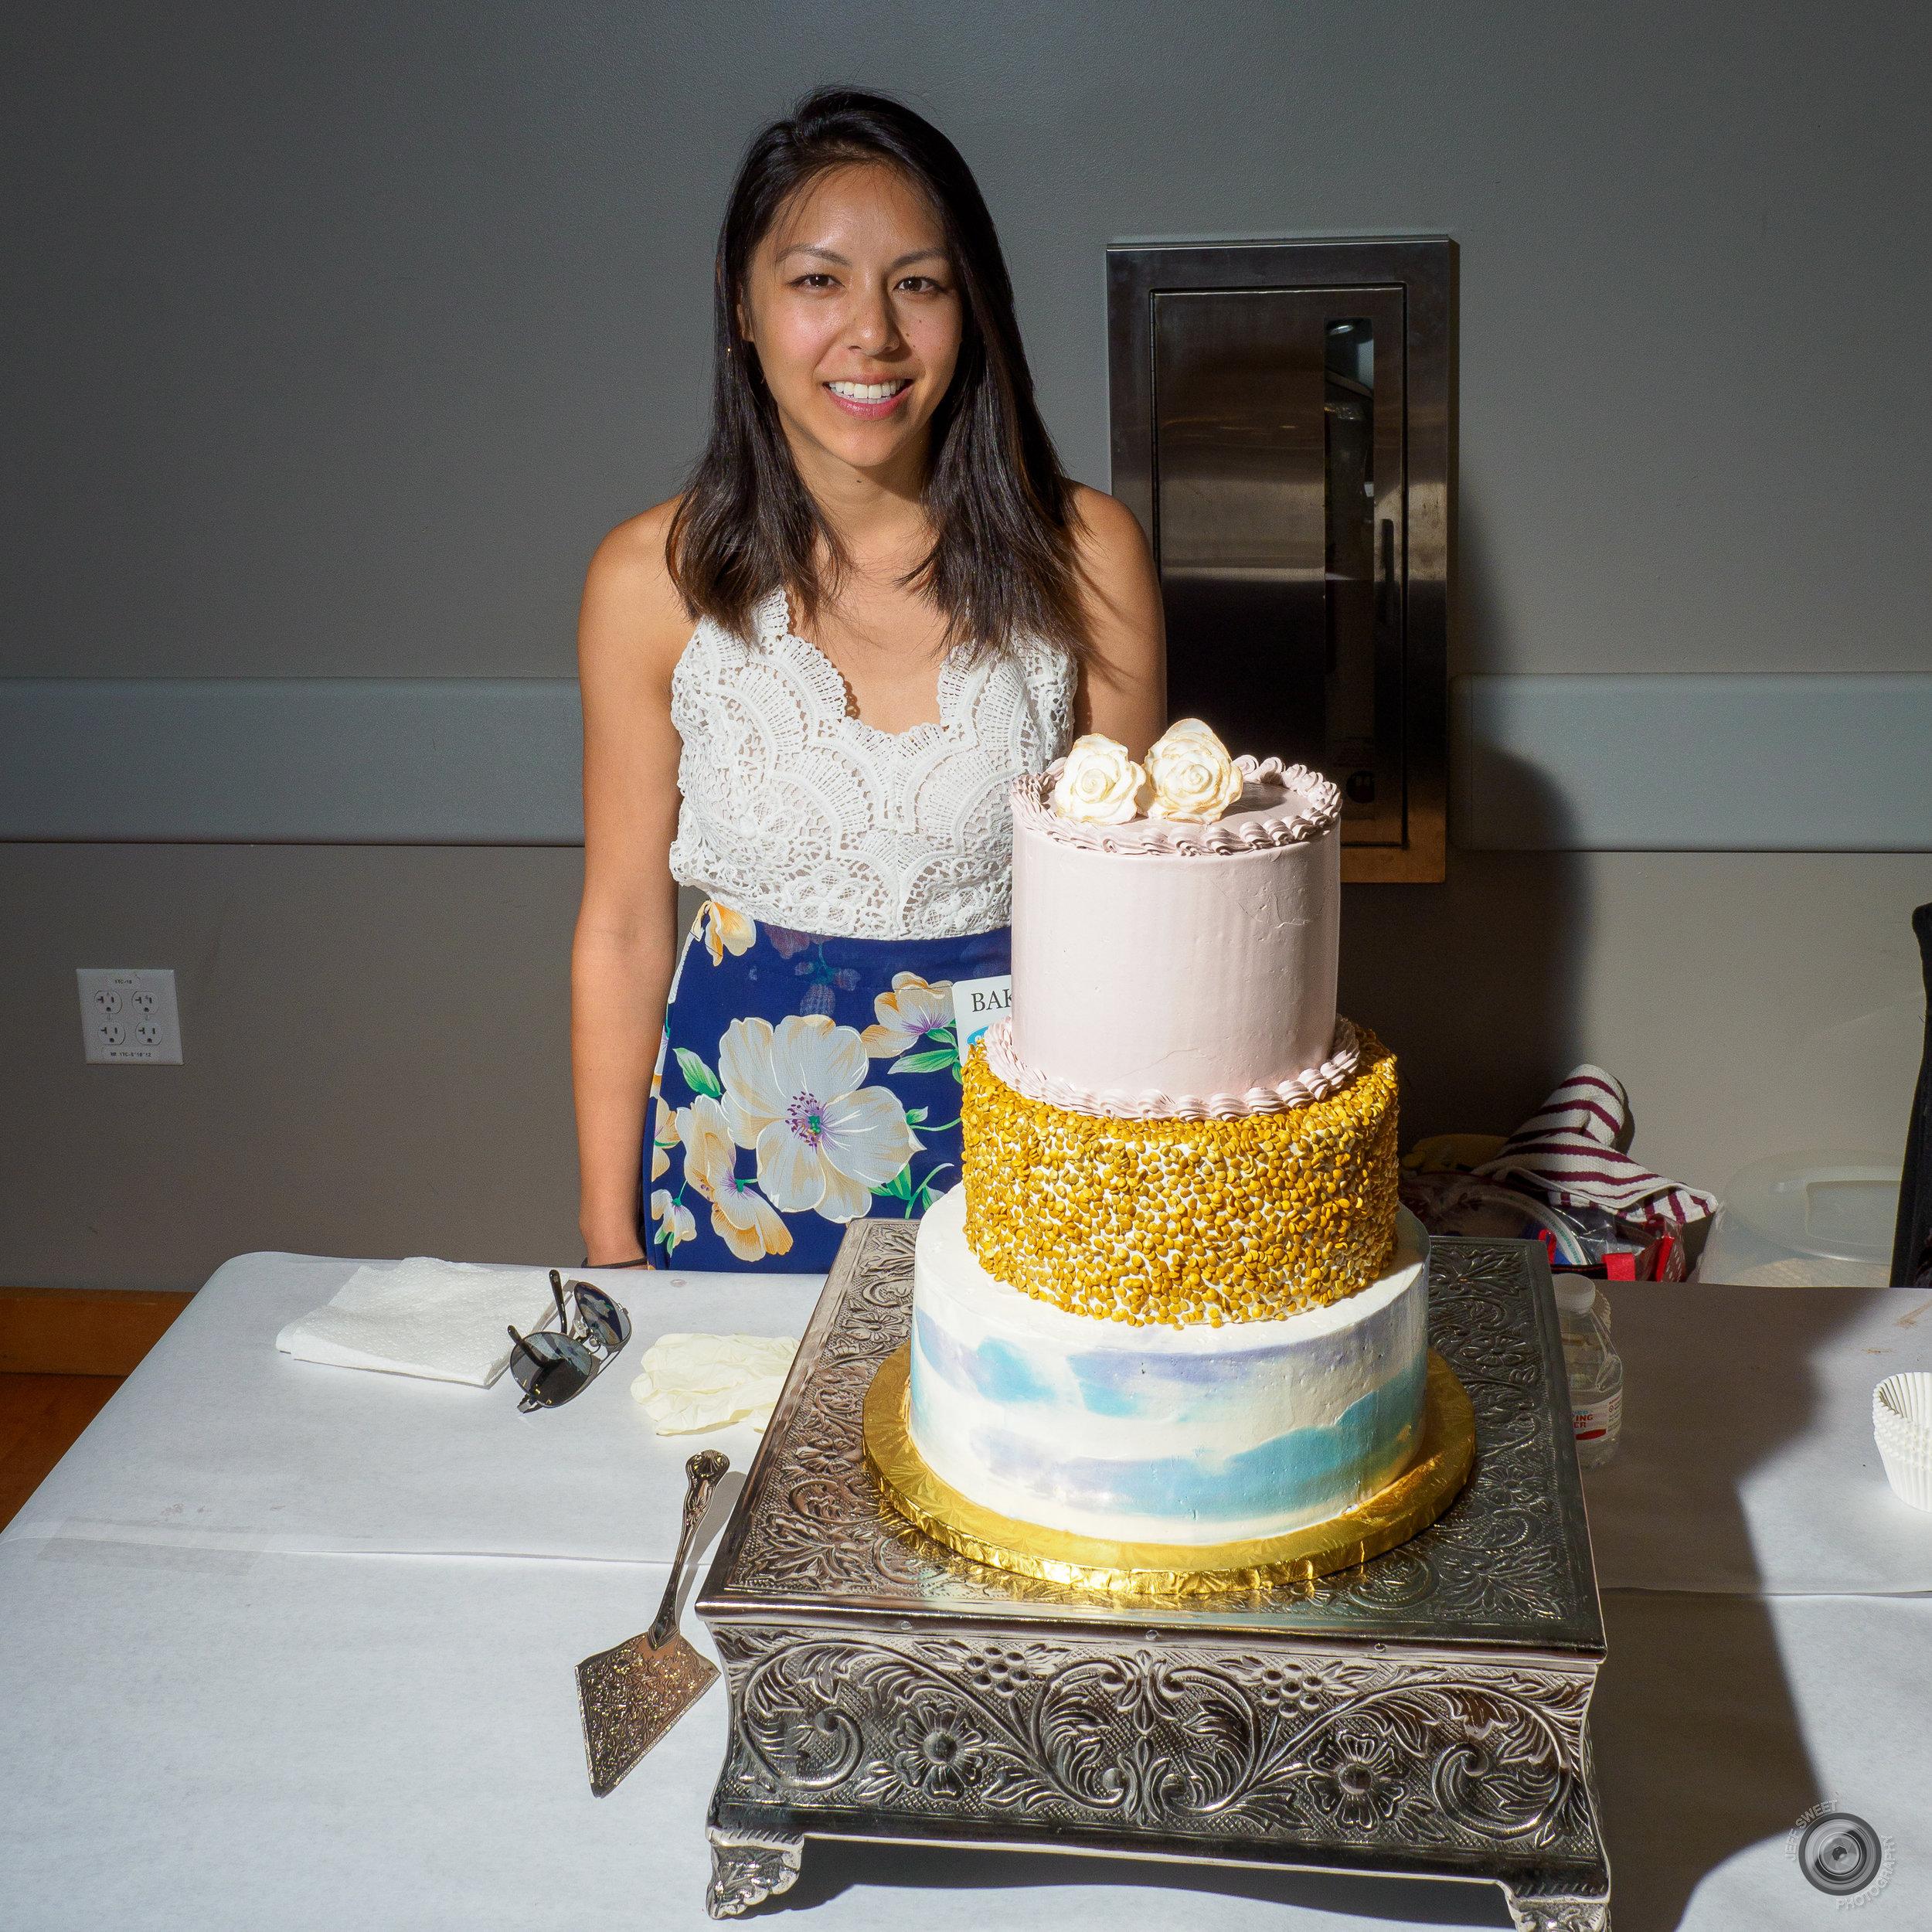 2018 Cake-Off4Kids-34.jpg